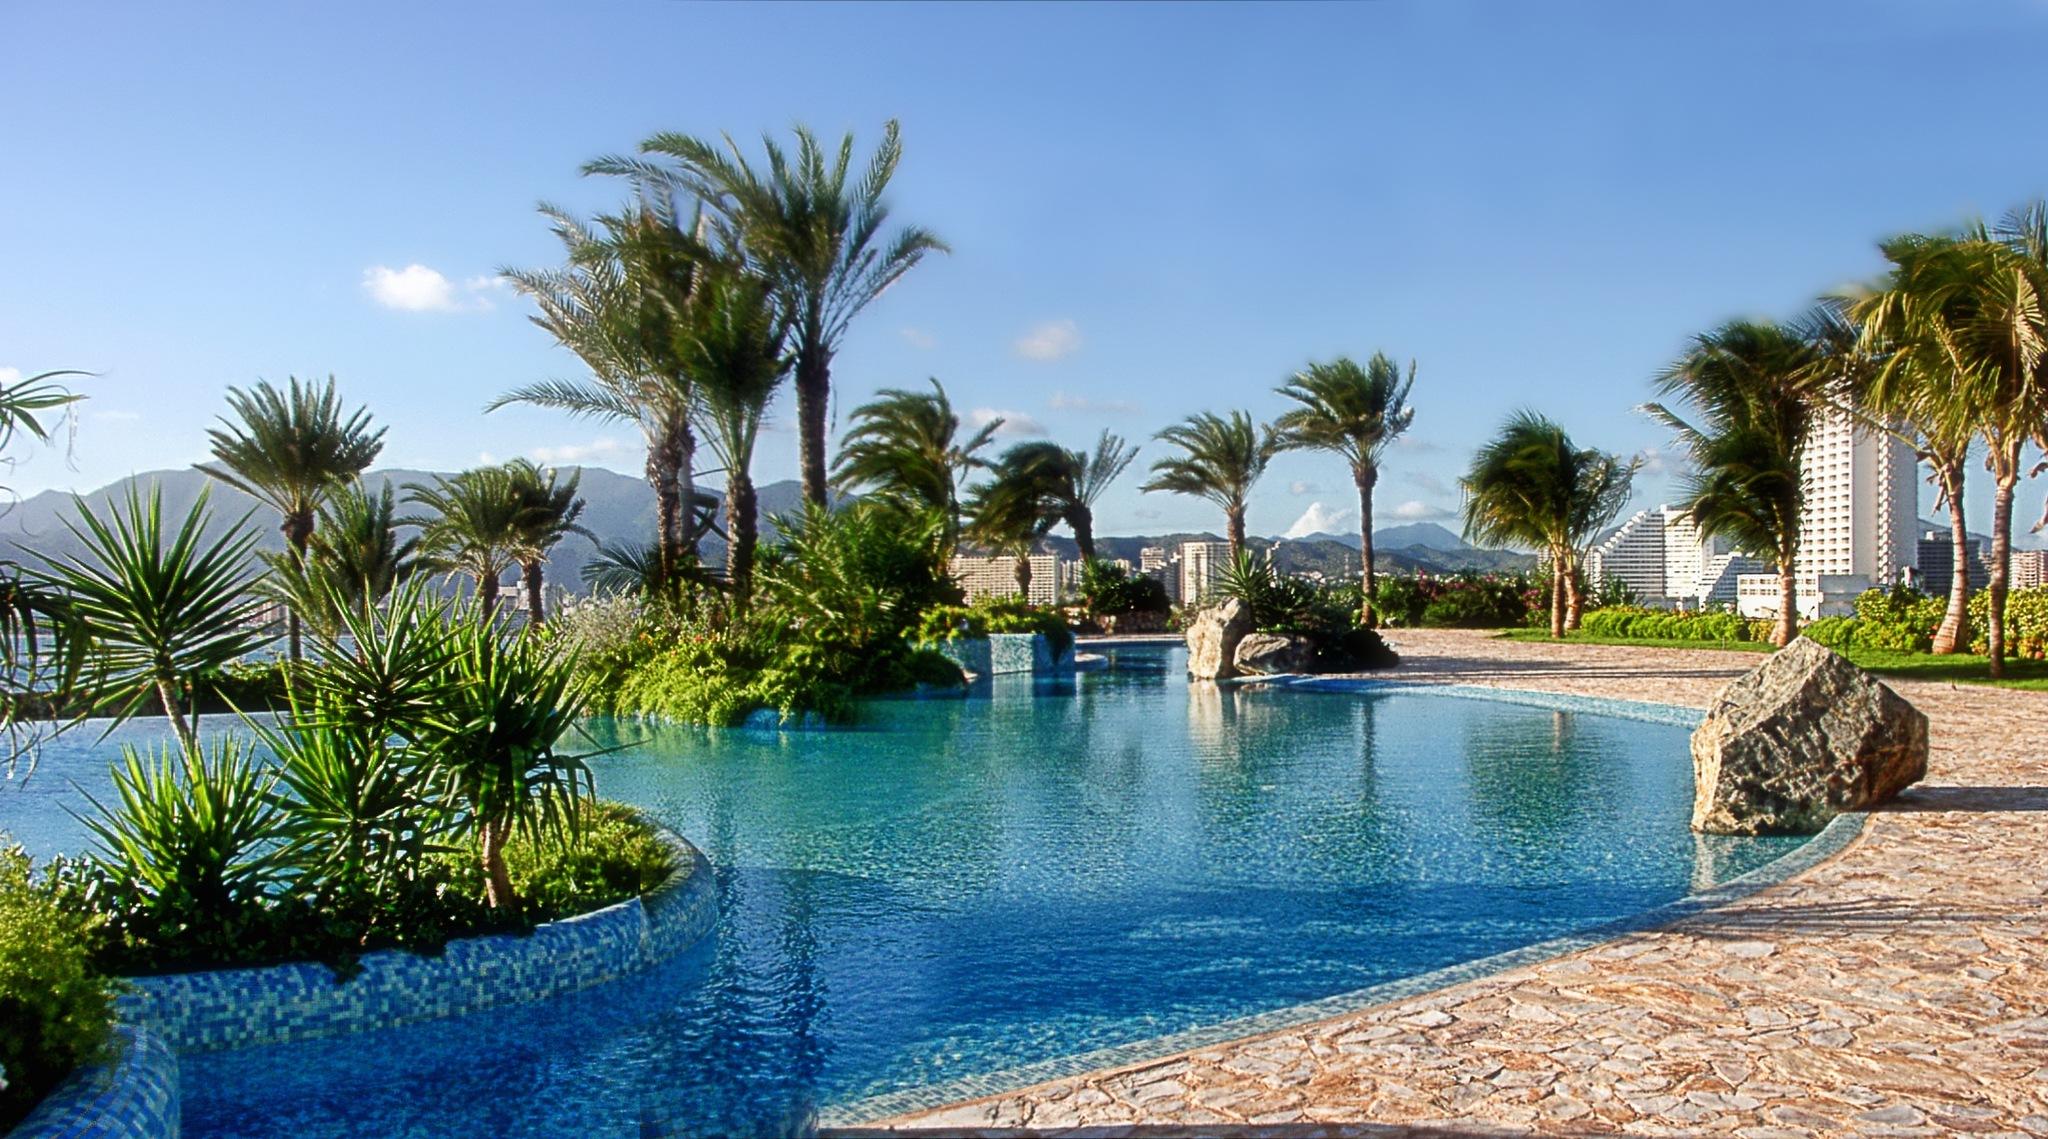 La piscina - Poolside by Juan Manuel